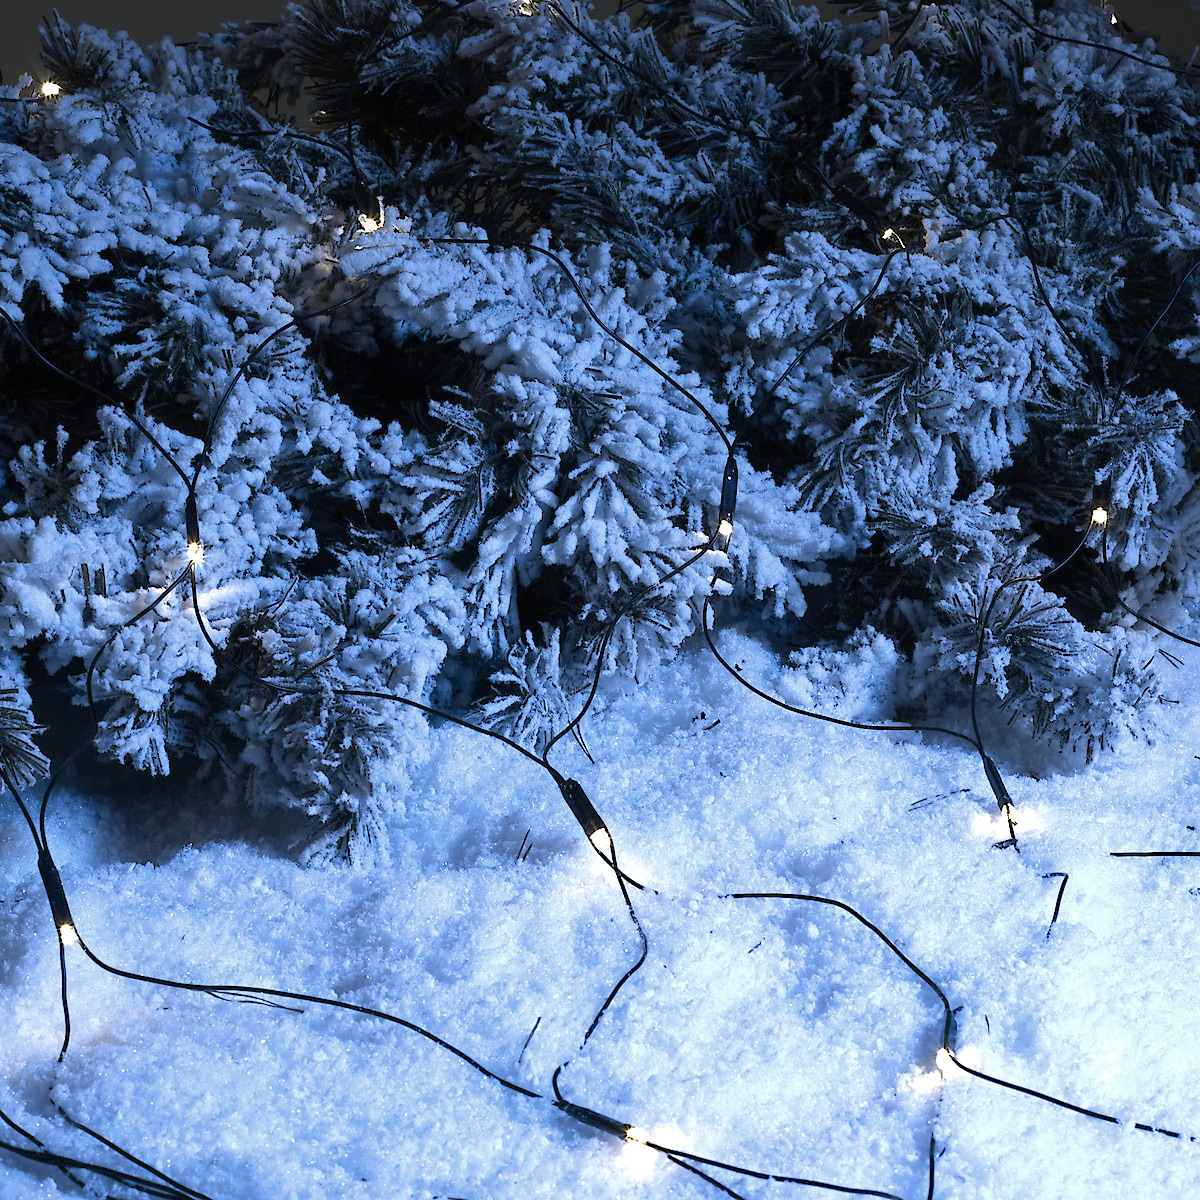 Ljusnät LED 2 x 3 m, Northlight